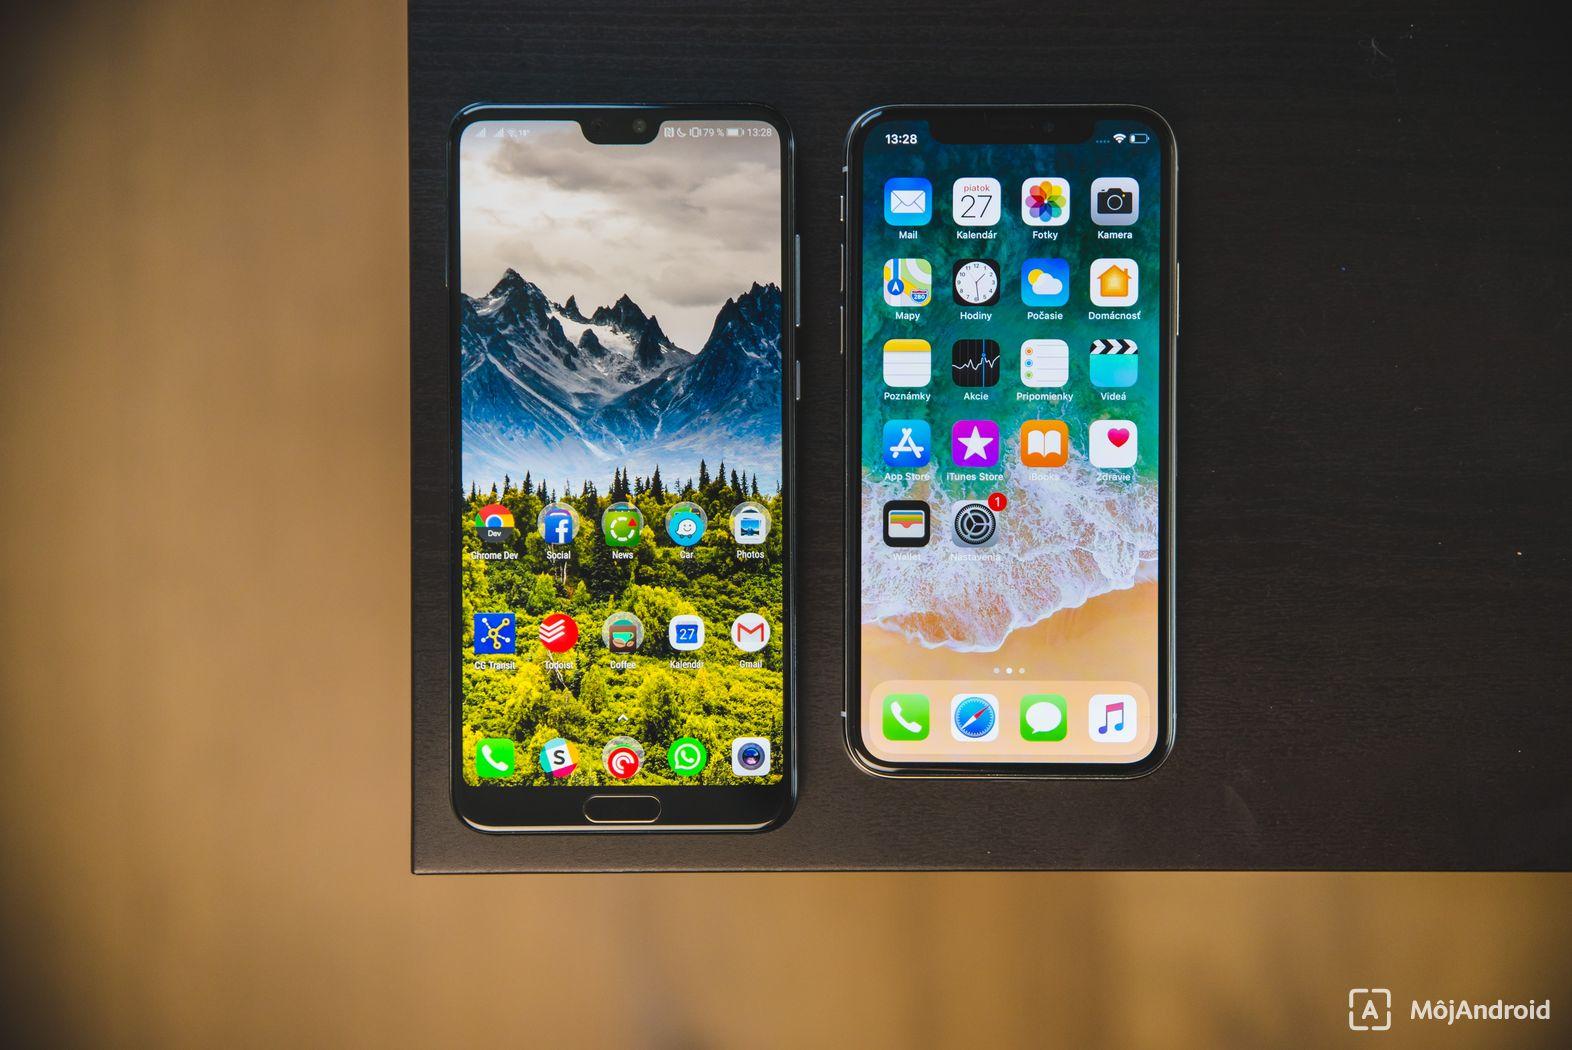 Iphone x o huawei p20 Codes - 2019